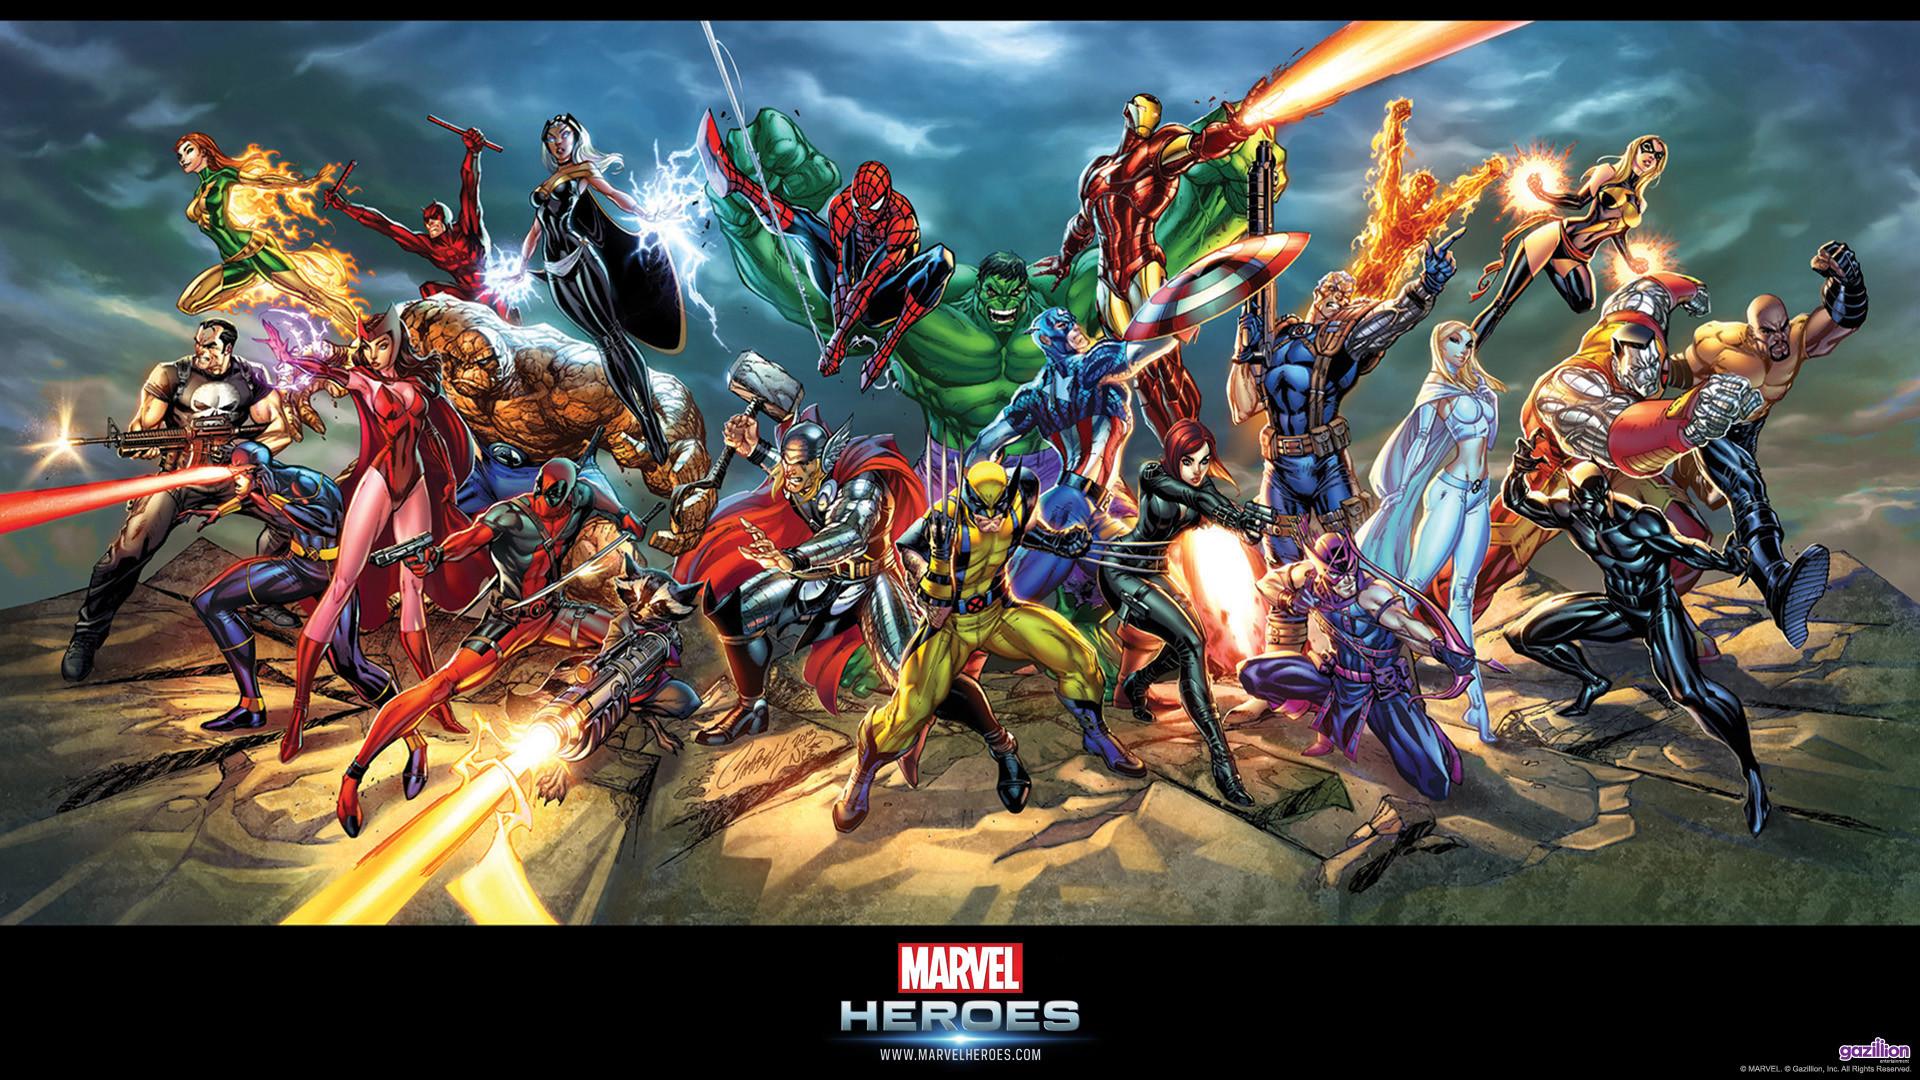 marvel-heroes-full-HD-wallpaper-1920x1080_3